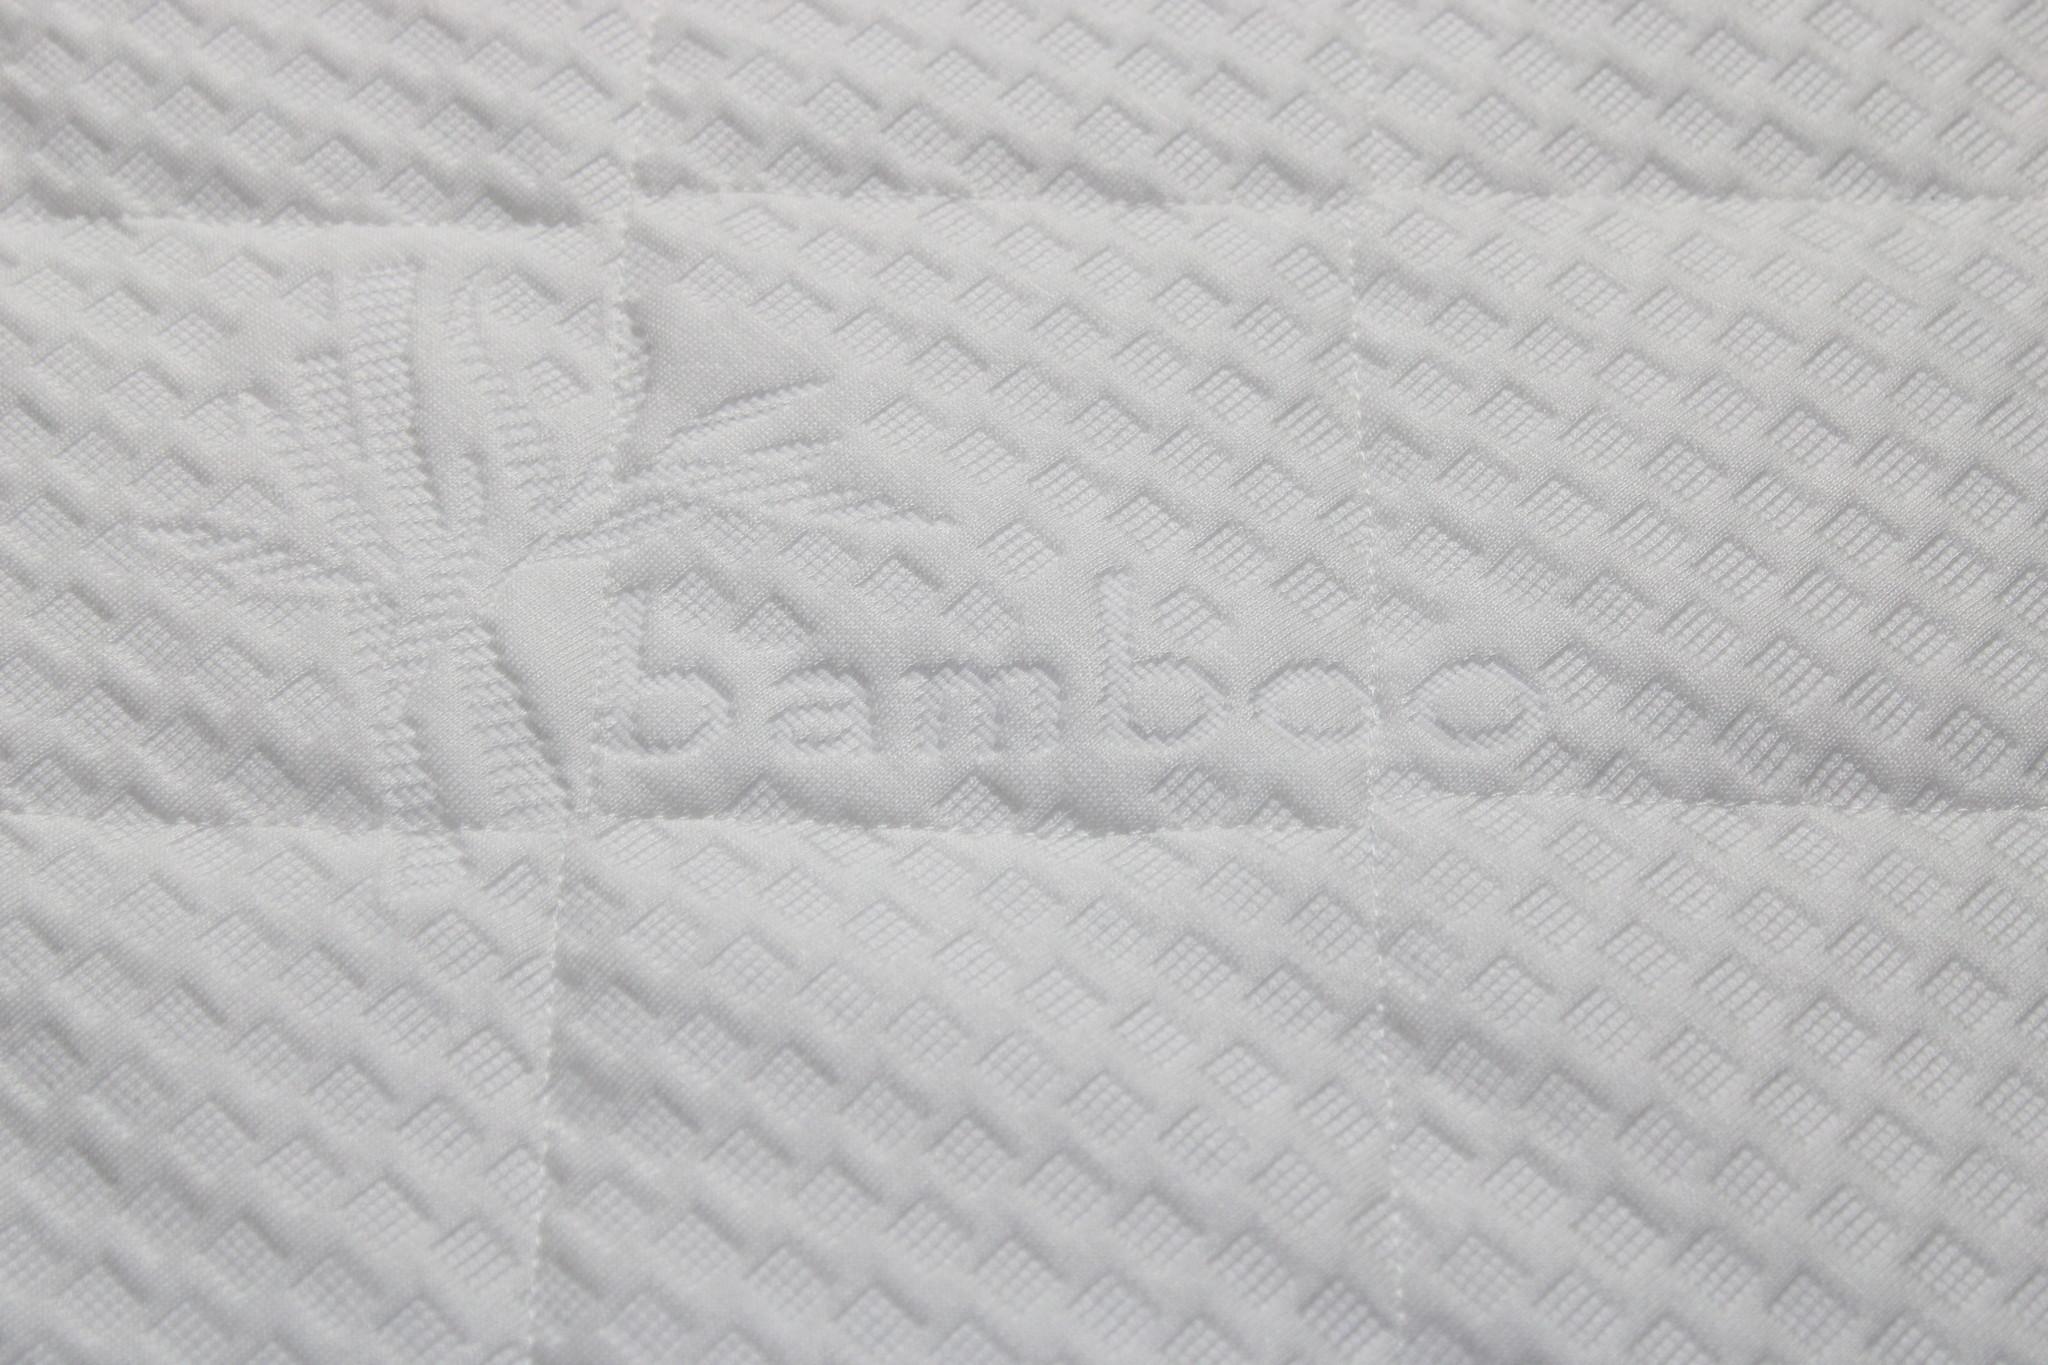 Sarpy Kindermatras 80x190 koudschuim hr40 bamboo